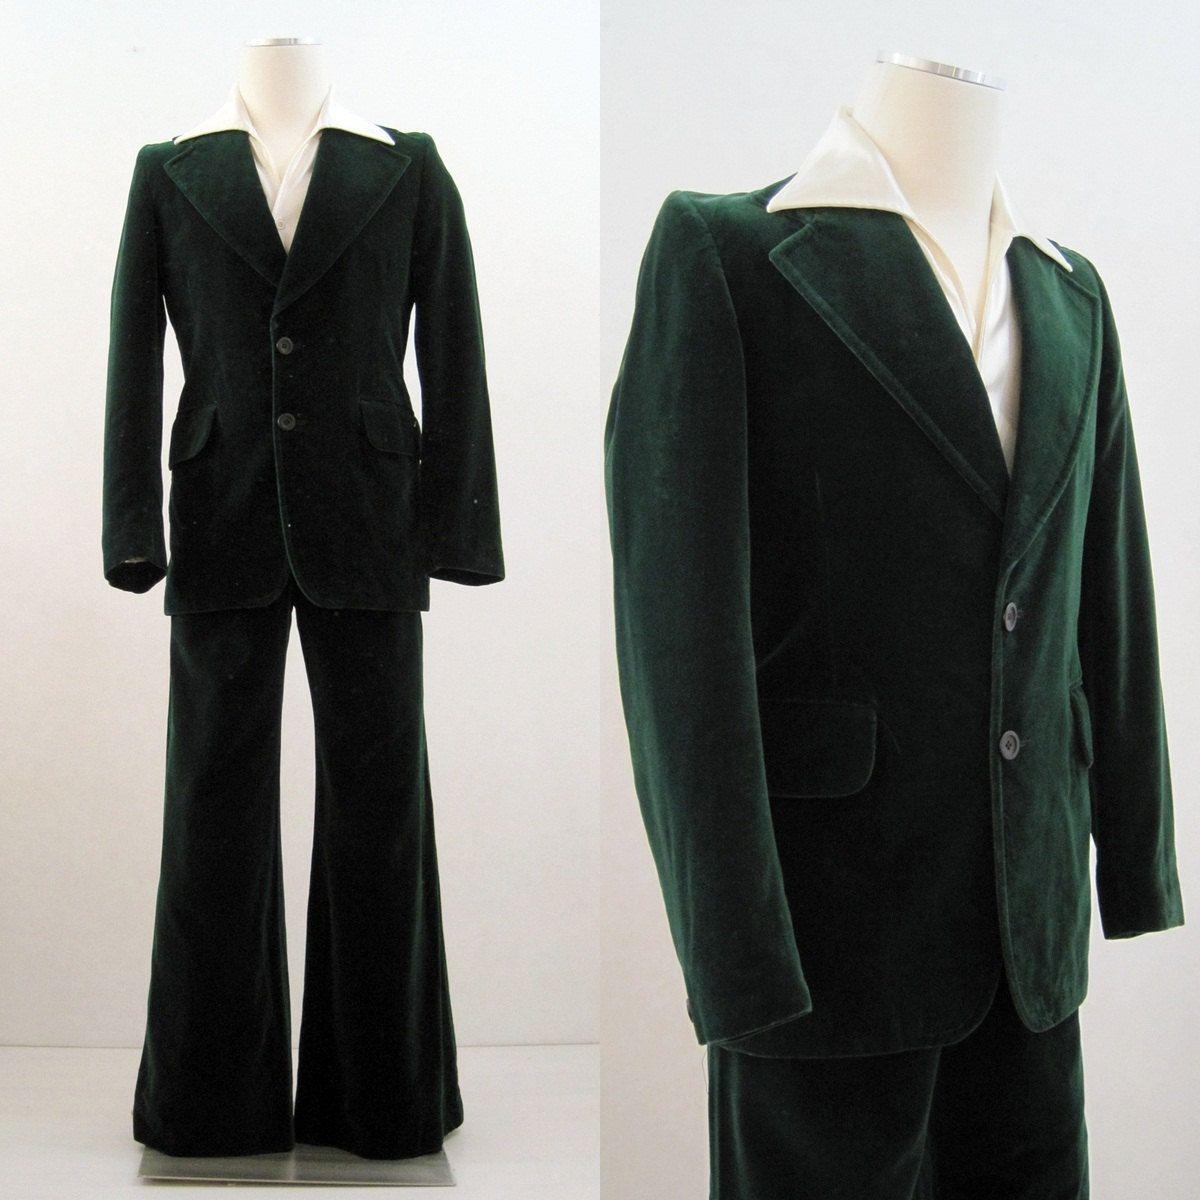 ec576b4cbb83 70s 80s Suit Vintage Men's Green Velvet Jacket & Wide Leg Pants Holiday S.